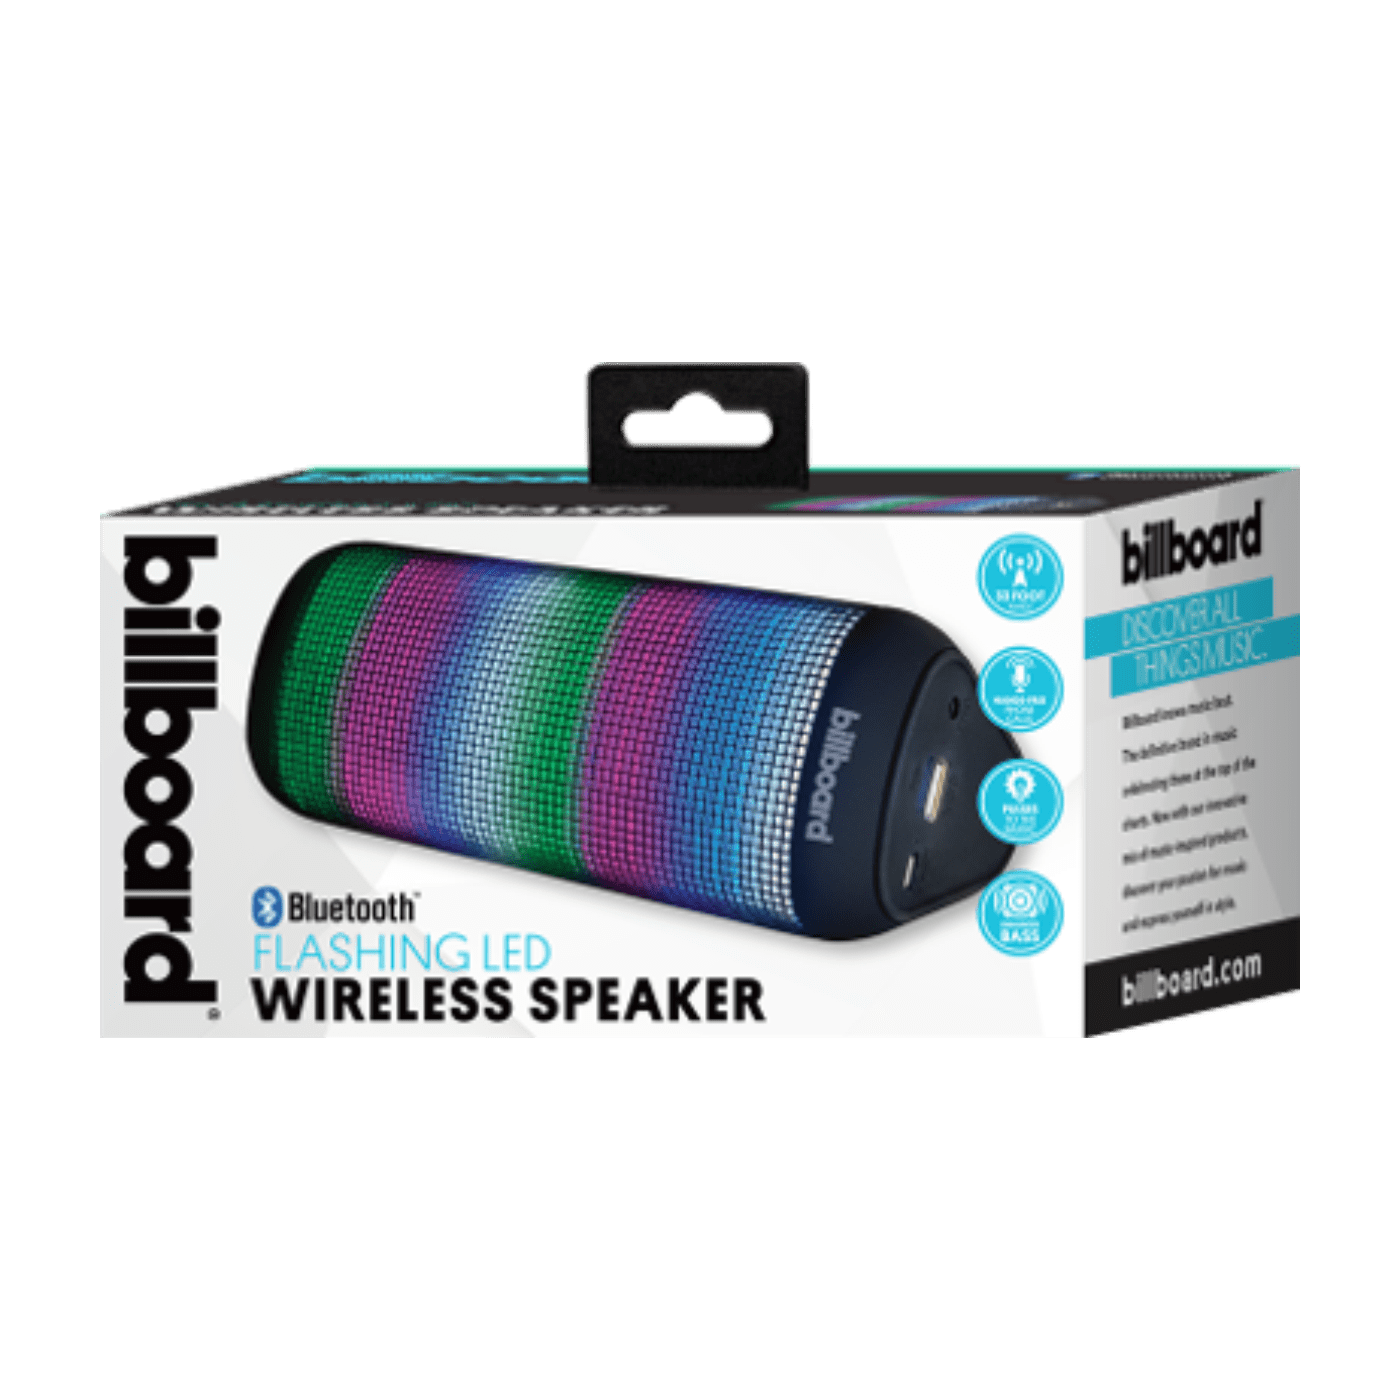 Billboard Bluetooth Flashing LED Wireless Speaker